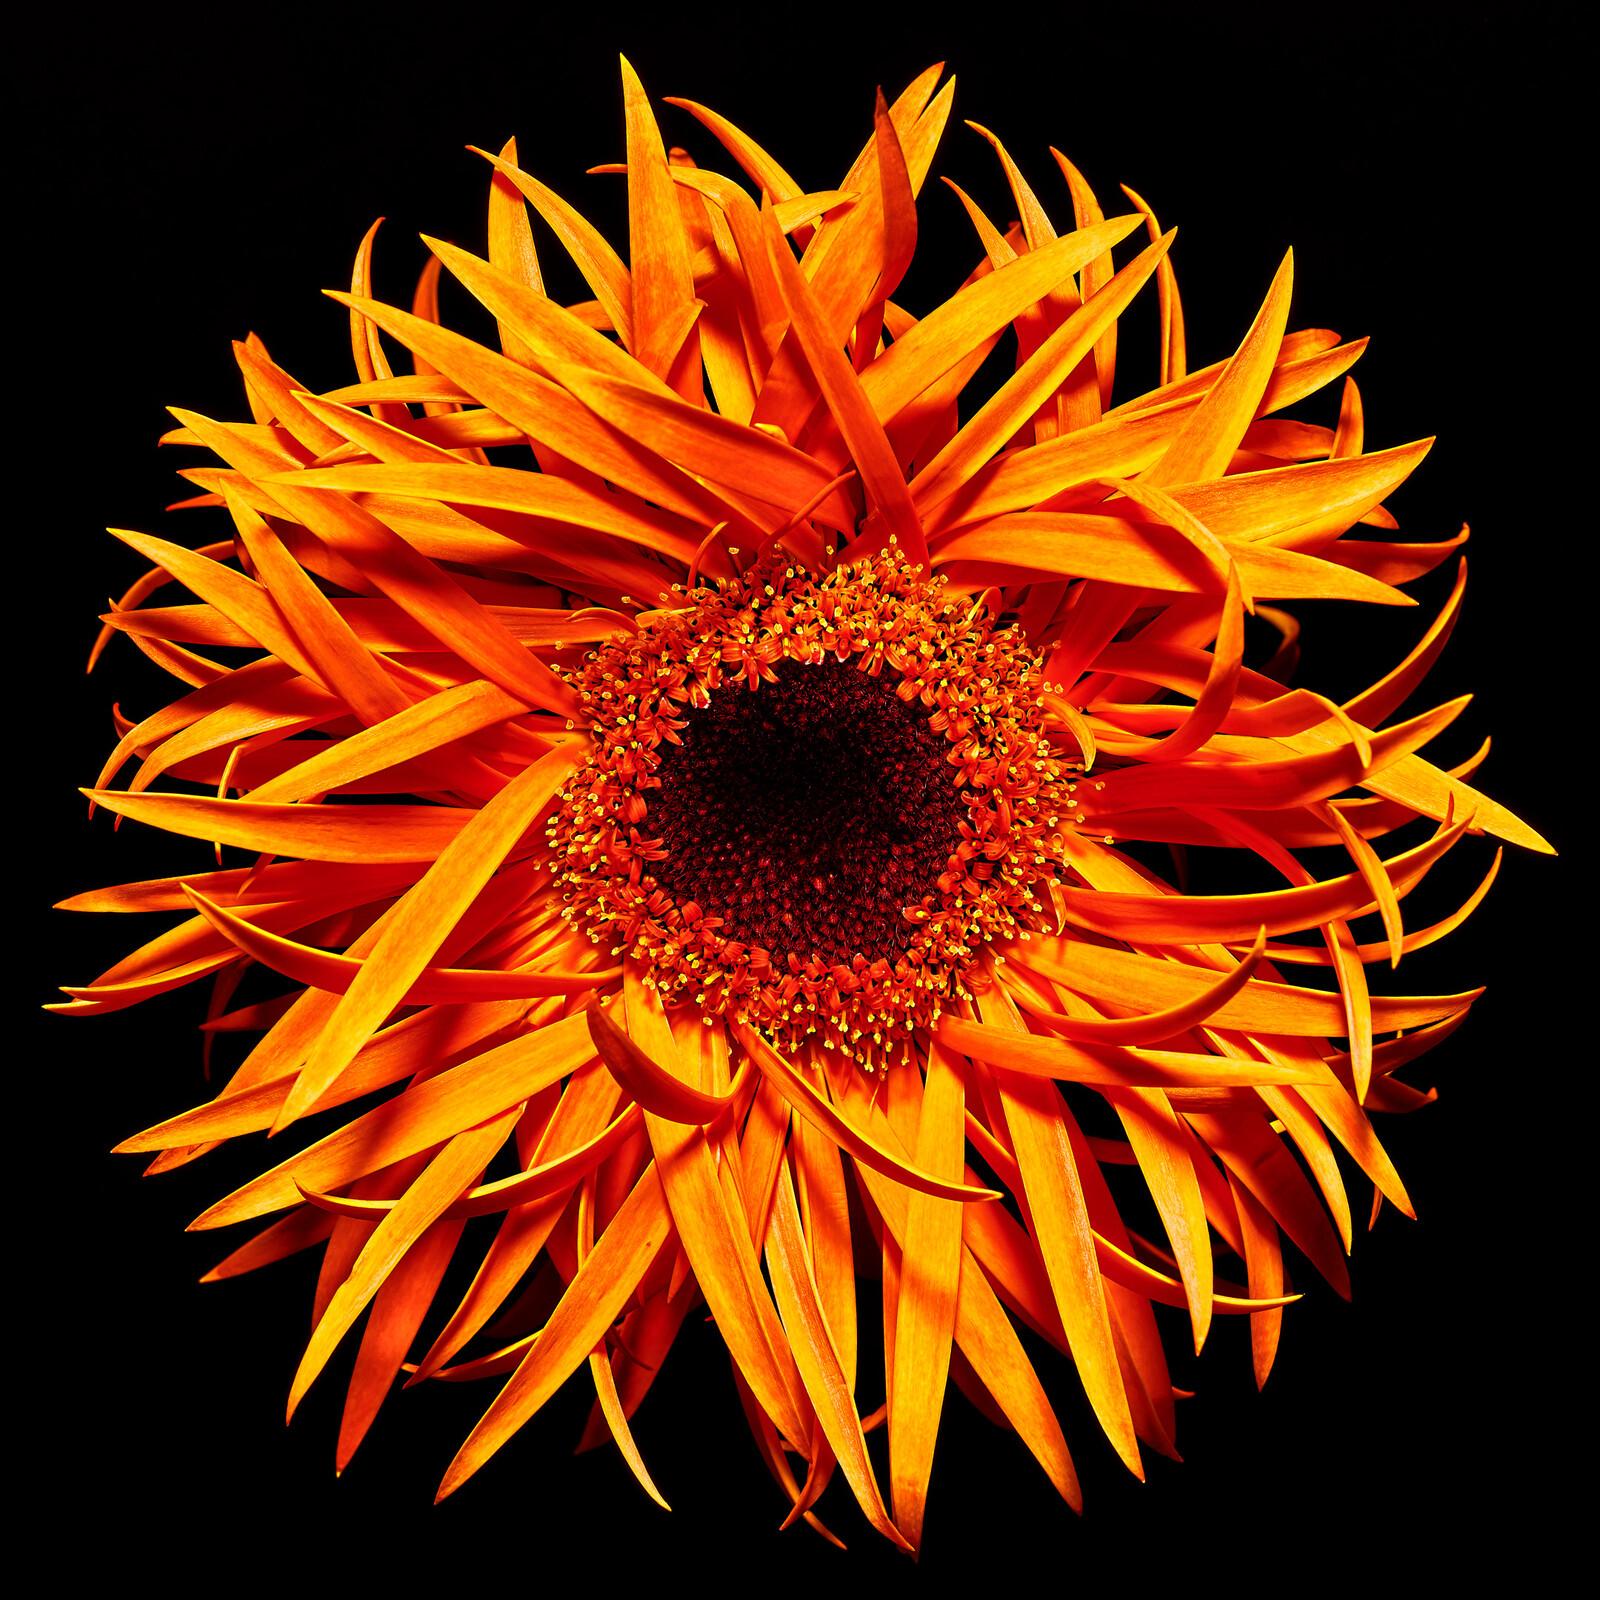 Blossom - Heiko Hellwig